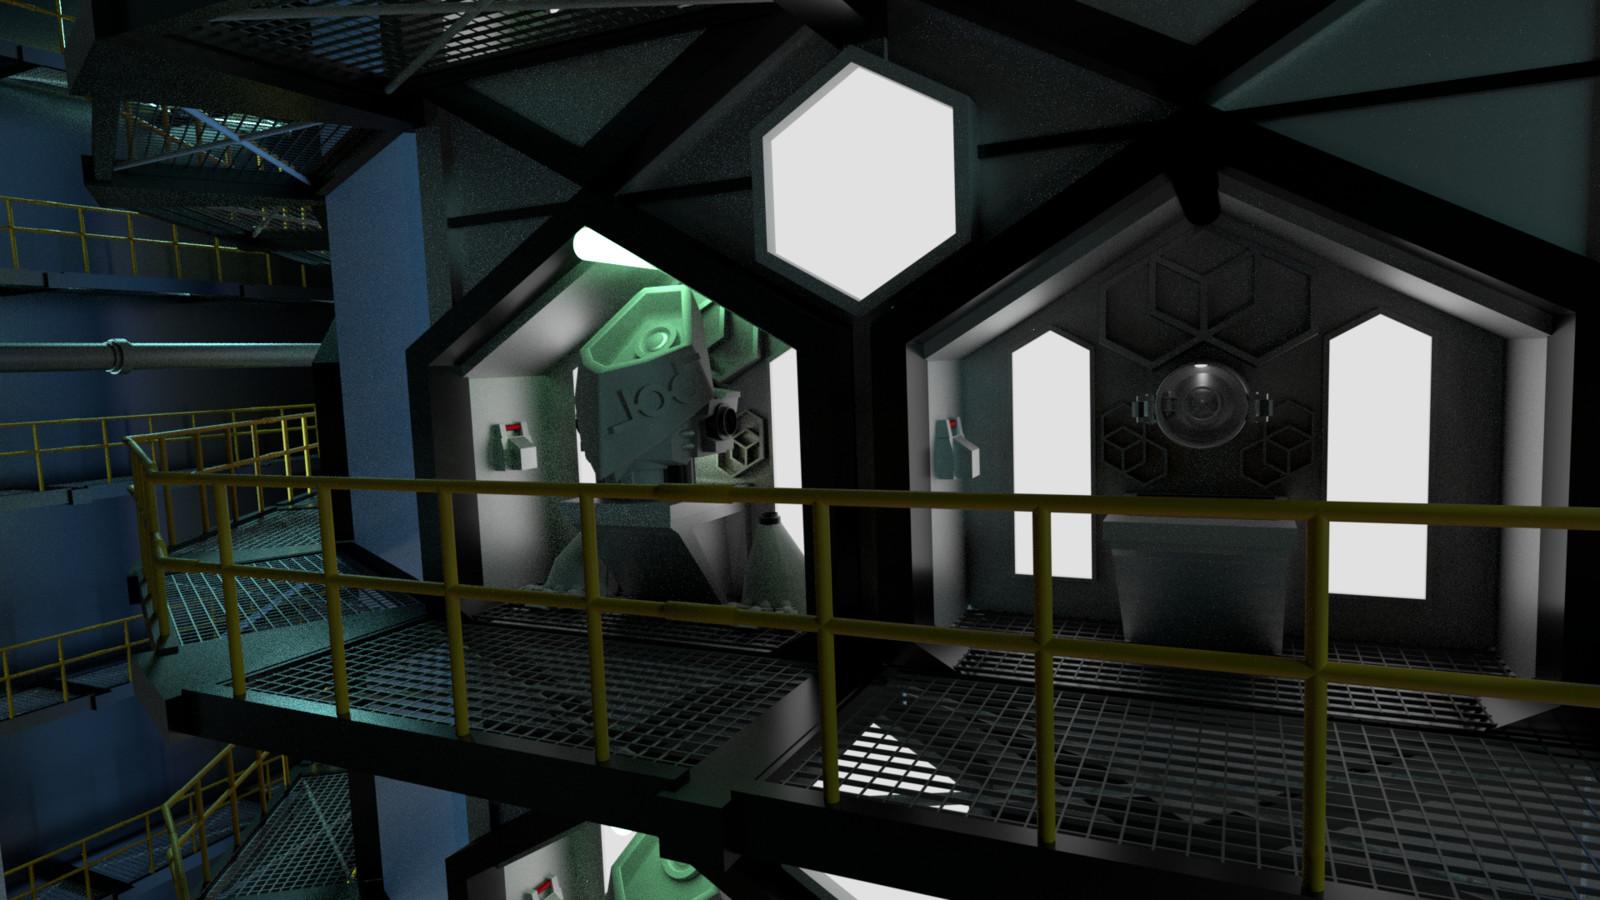 Close-up of the JOO-bot storage bays